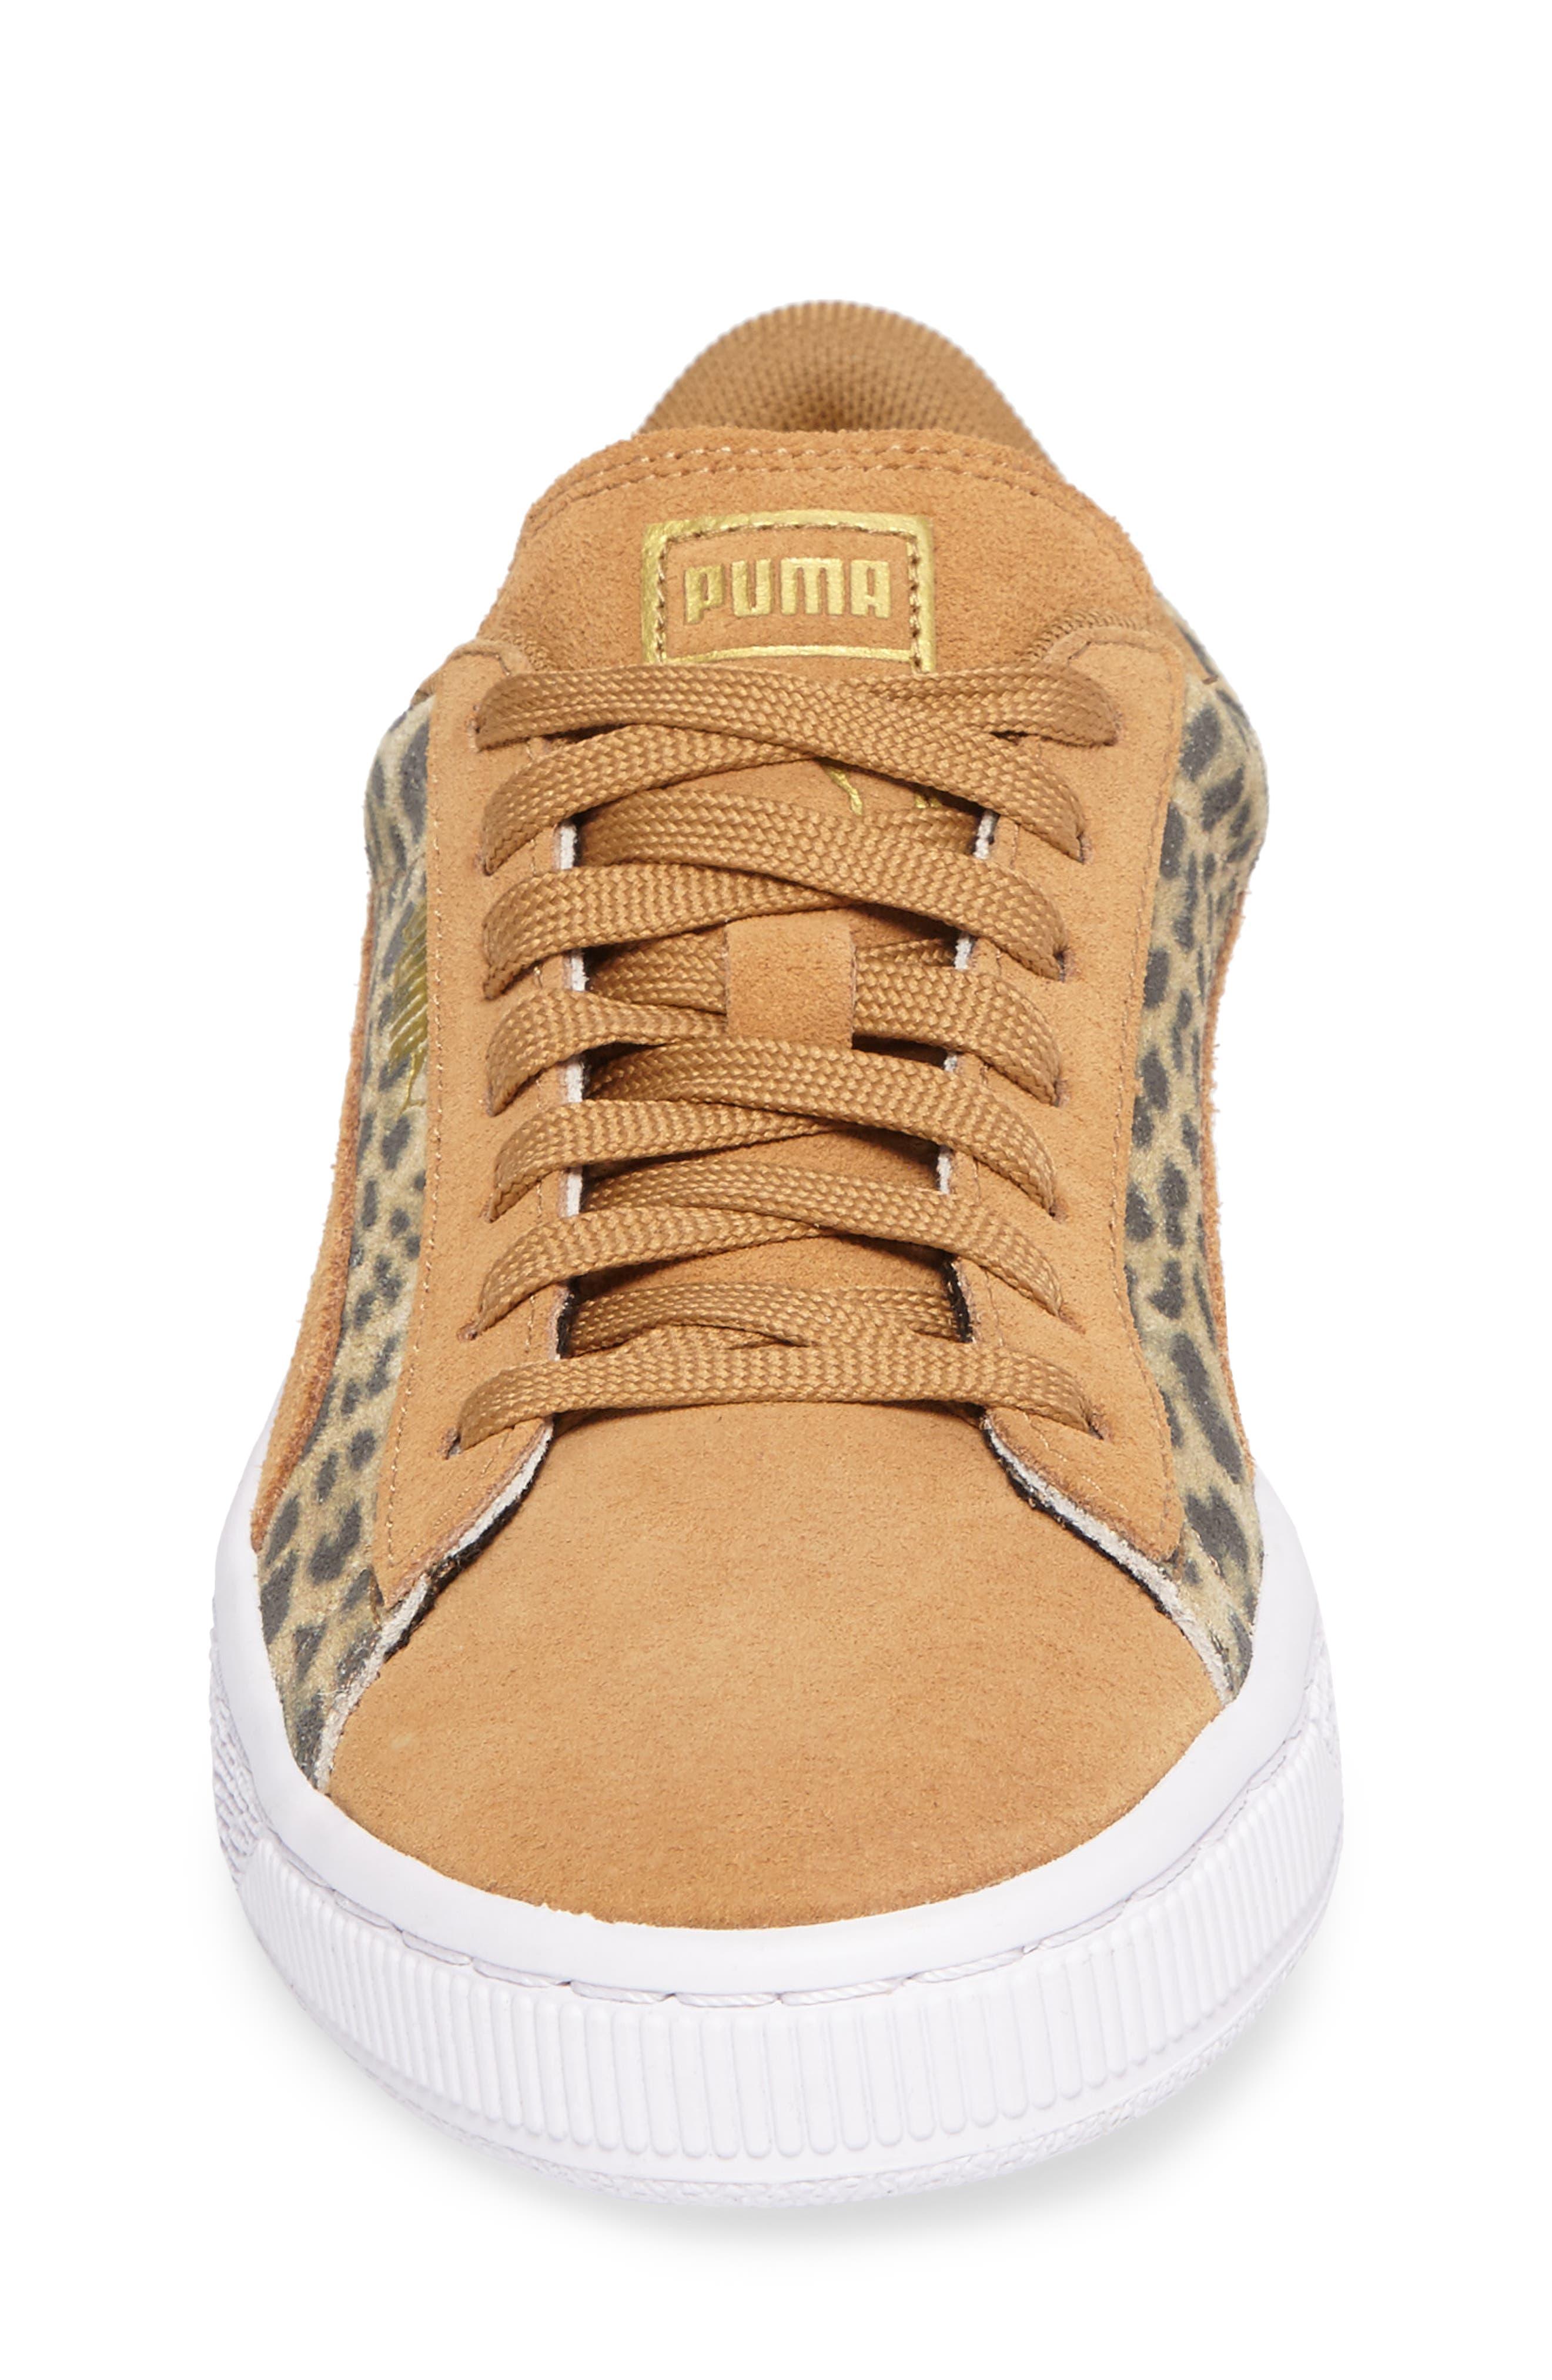 Suede Animal Sneaker,                             Alternate thumbnail 4, color,                             200